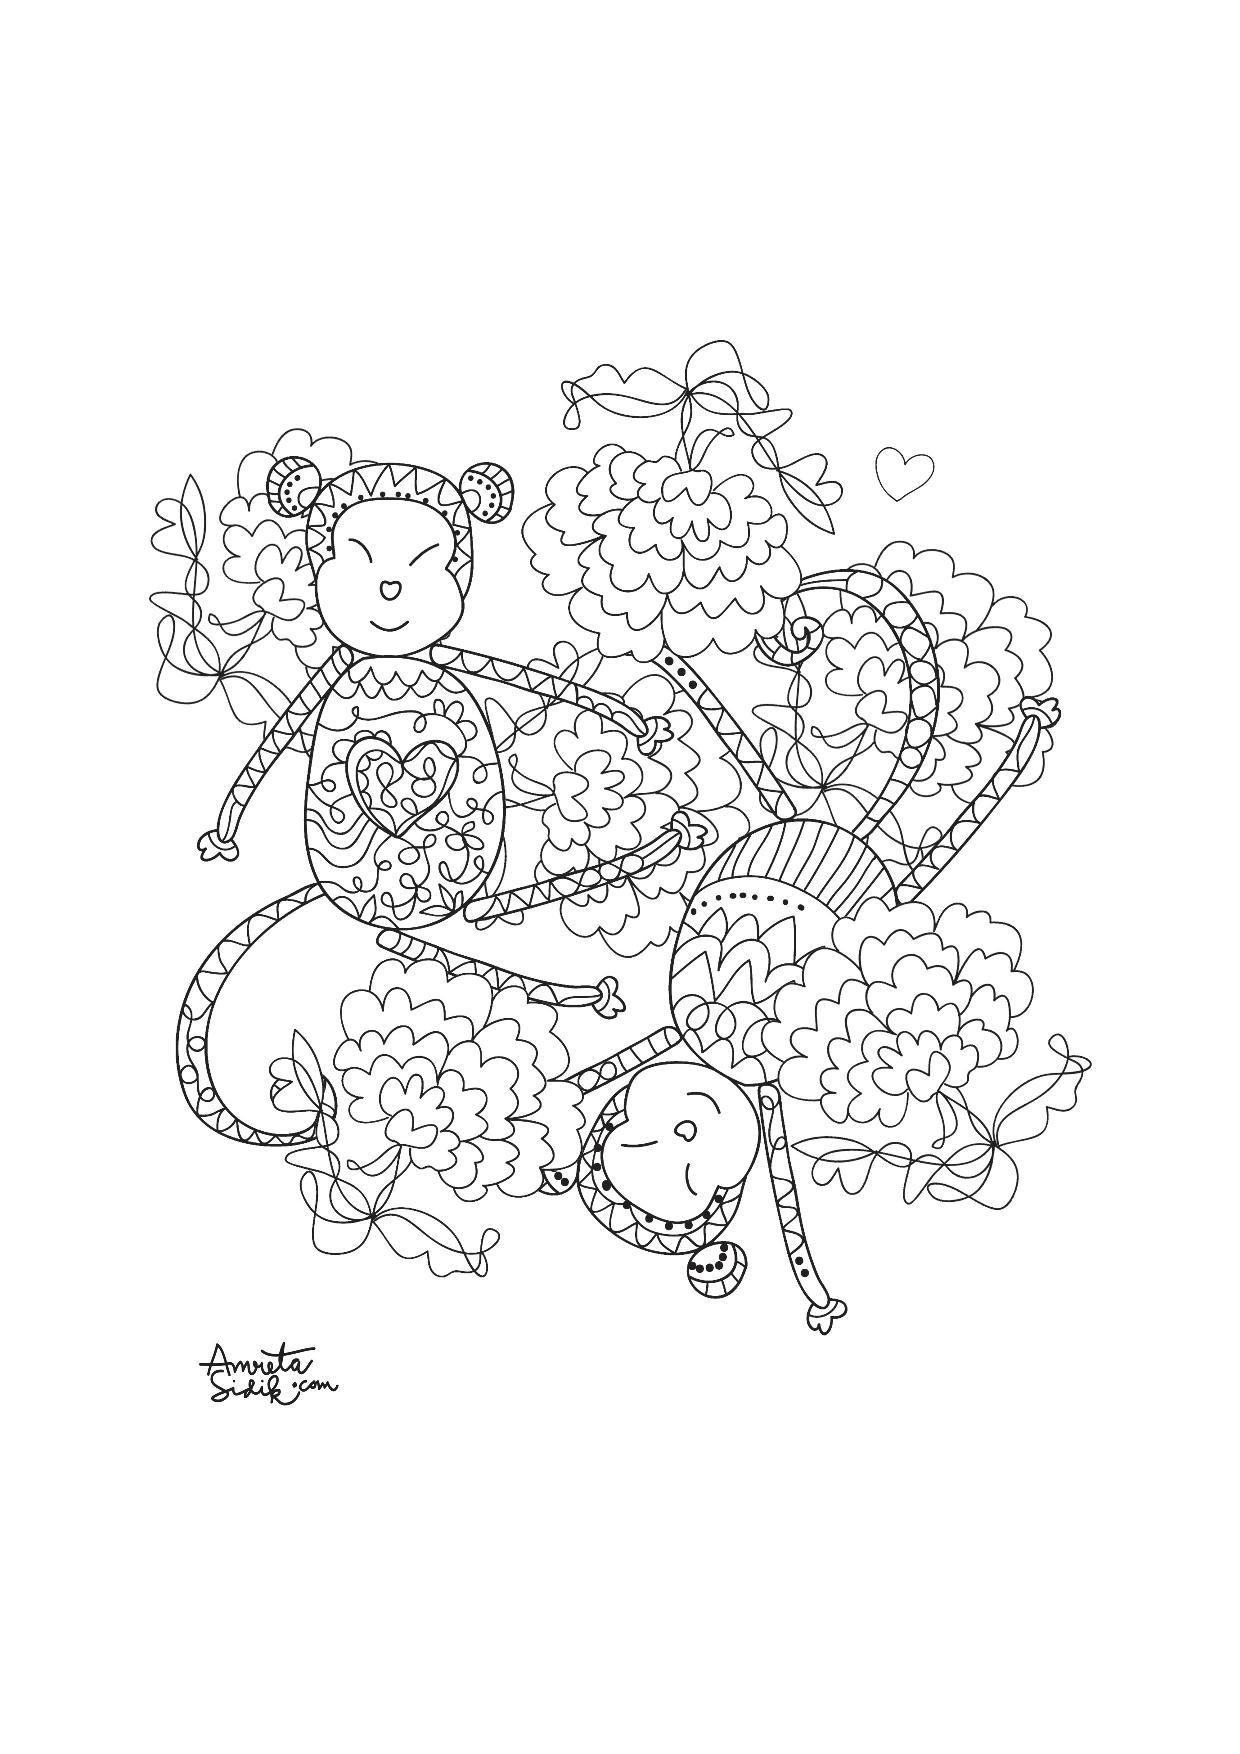 Annee du singe 1A partir de la galerie : Anti StressArtiste : Amreta Sidik